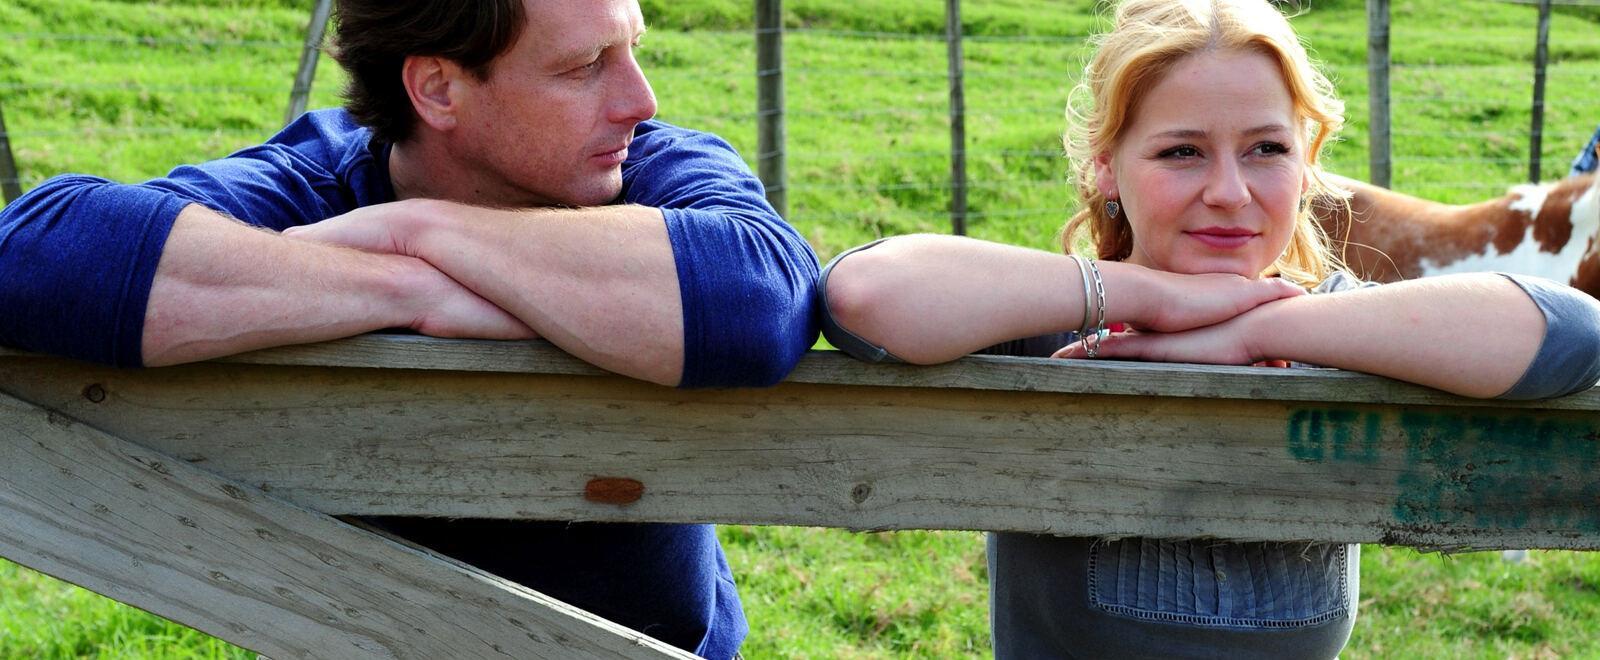 Emilie Richards - Una tata e tre nipoti